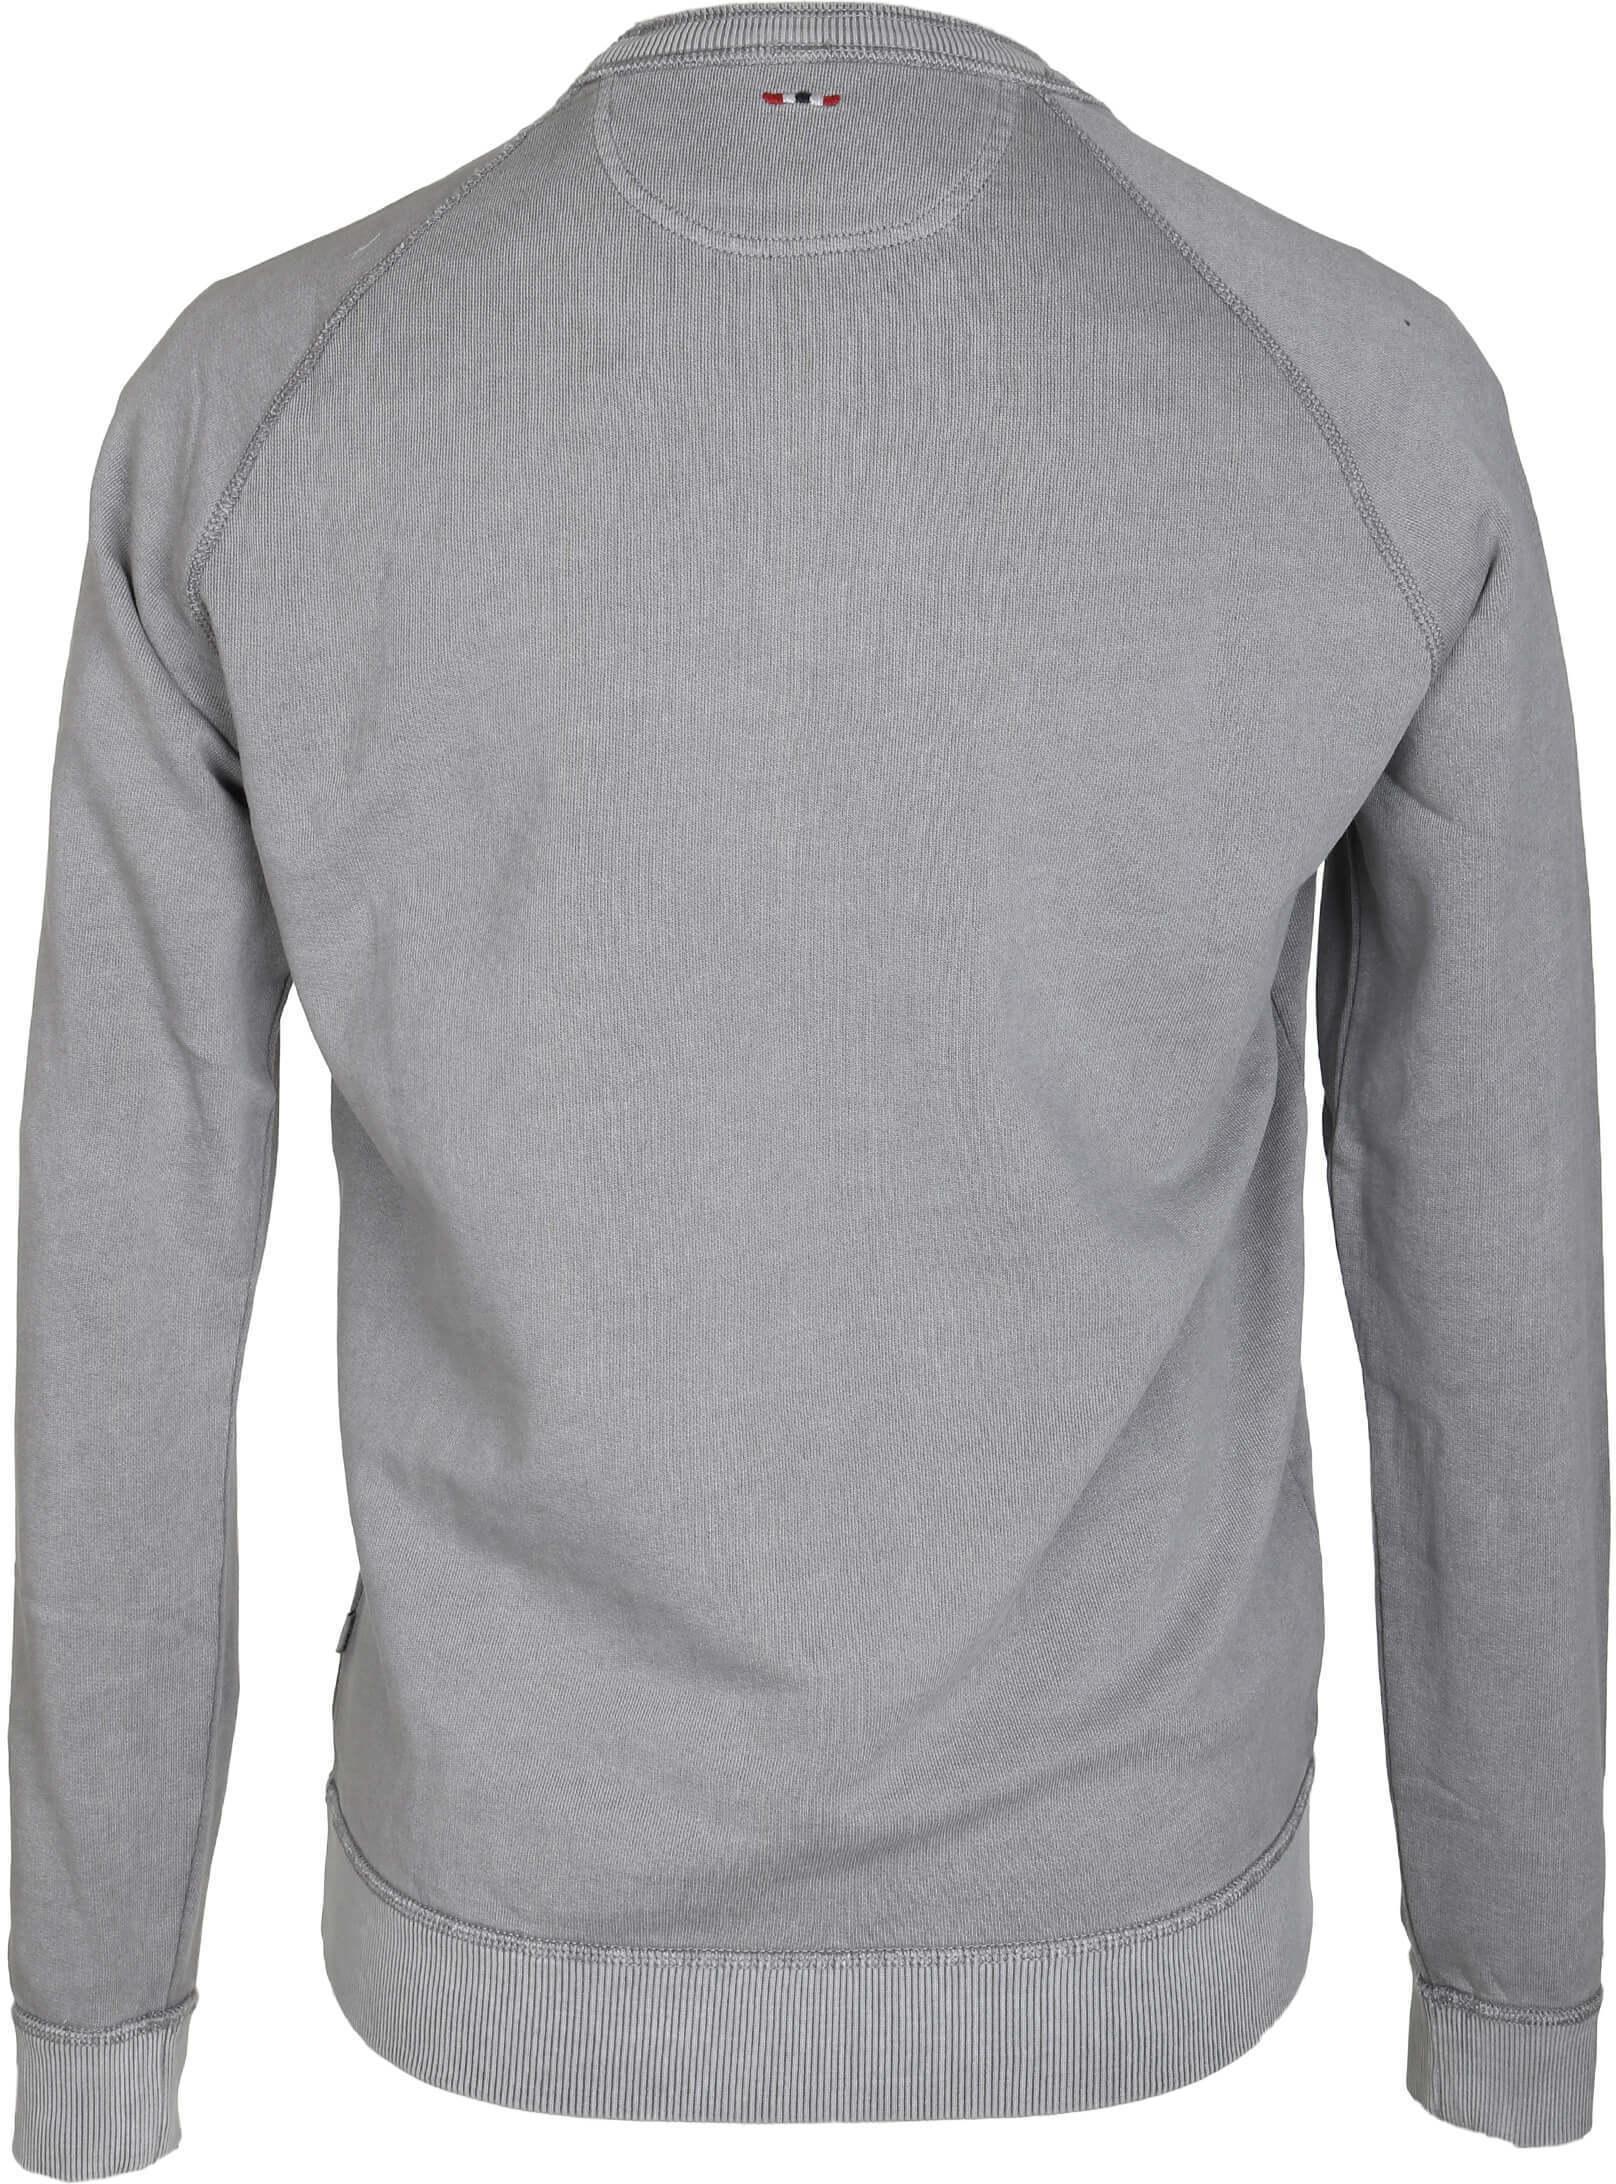 Napapijri Sweater Grijs foto 1